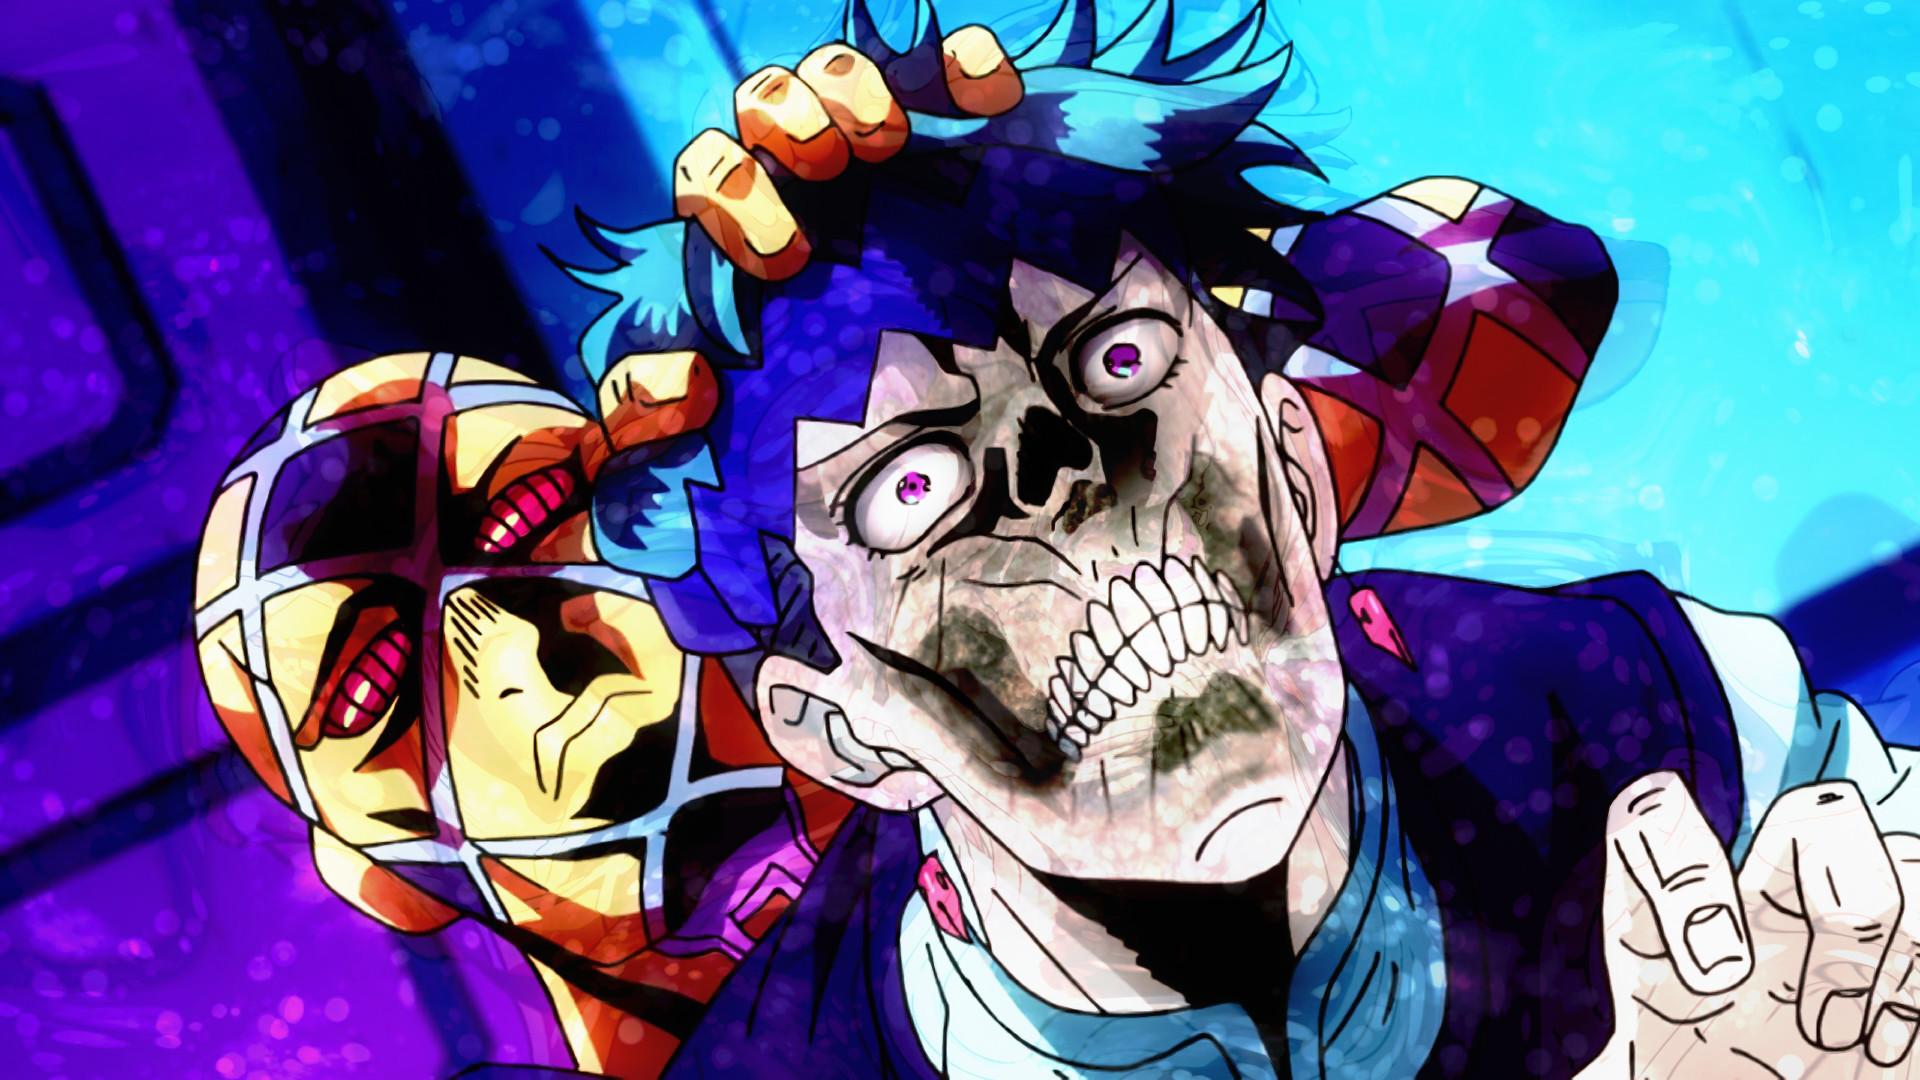 Anime – Jojo's Bizarre Adventure Rohan Kishibe Highway Star (Jojo's Bizarre  Adventure) Wallpaper